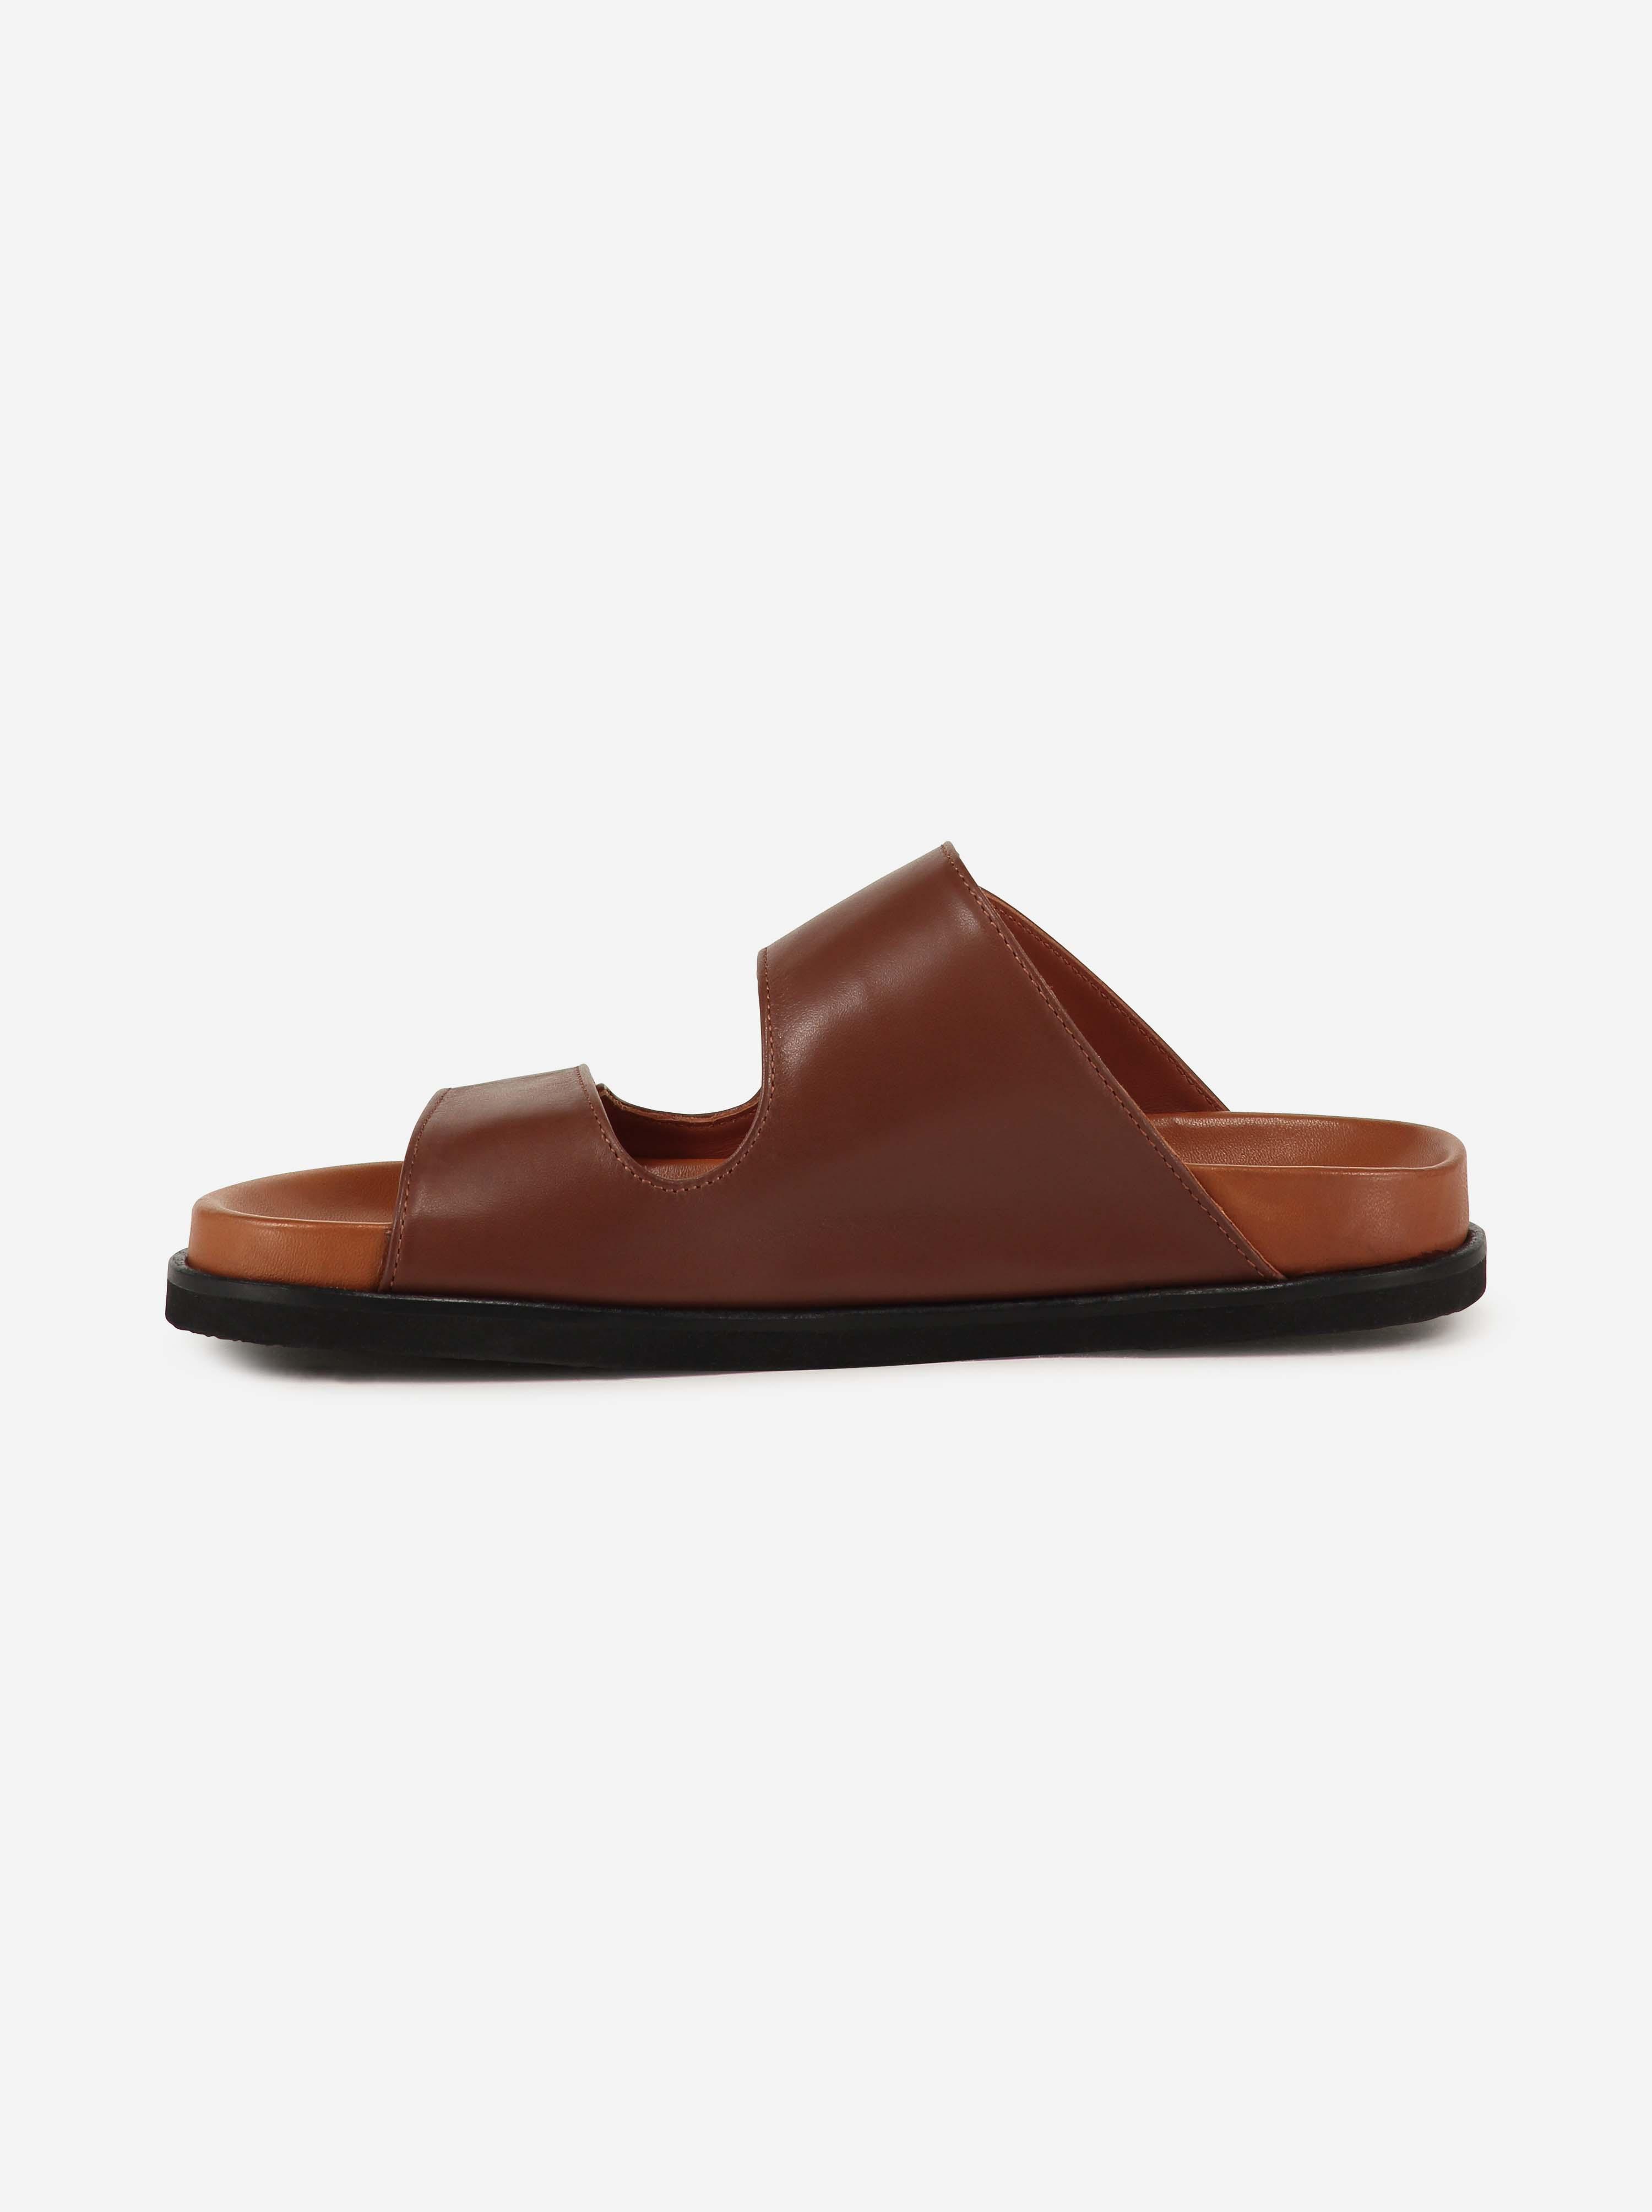 Teym - The Sandal - Brown - 3